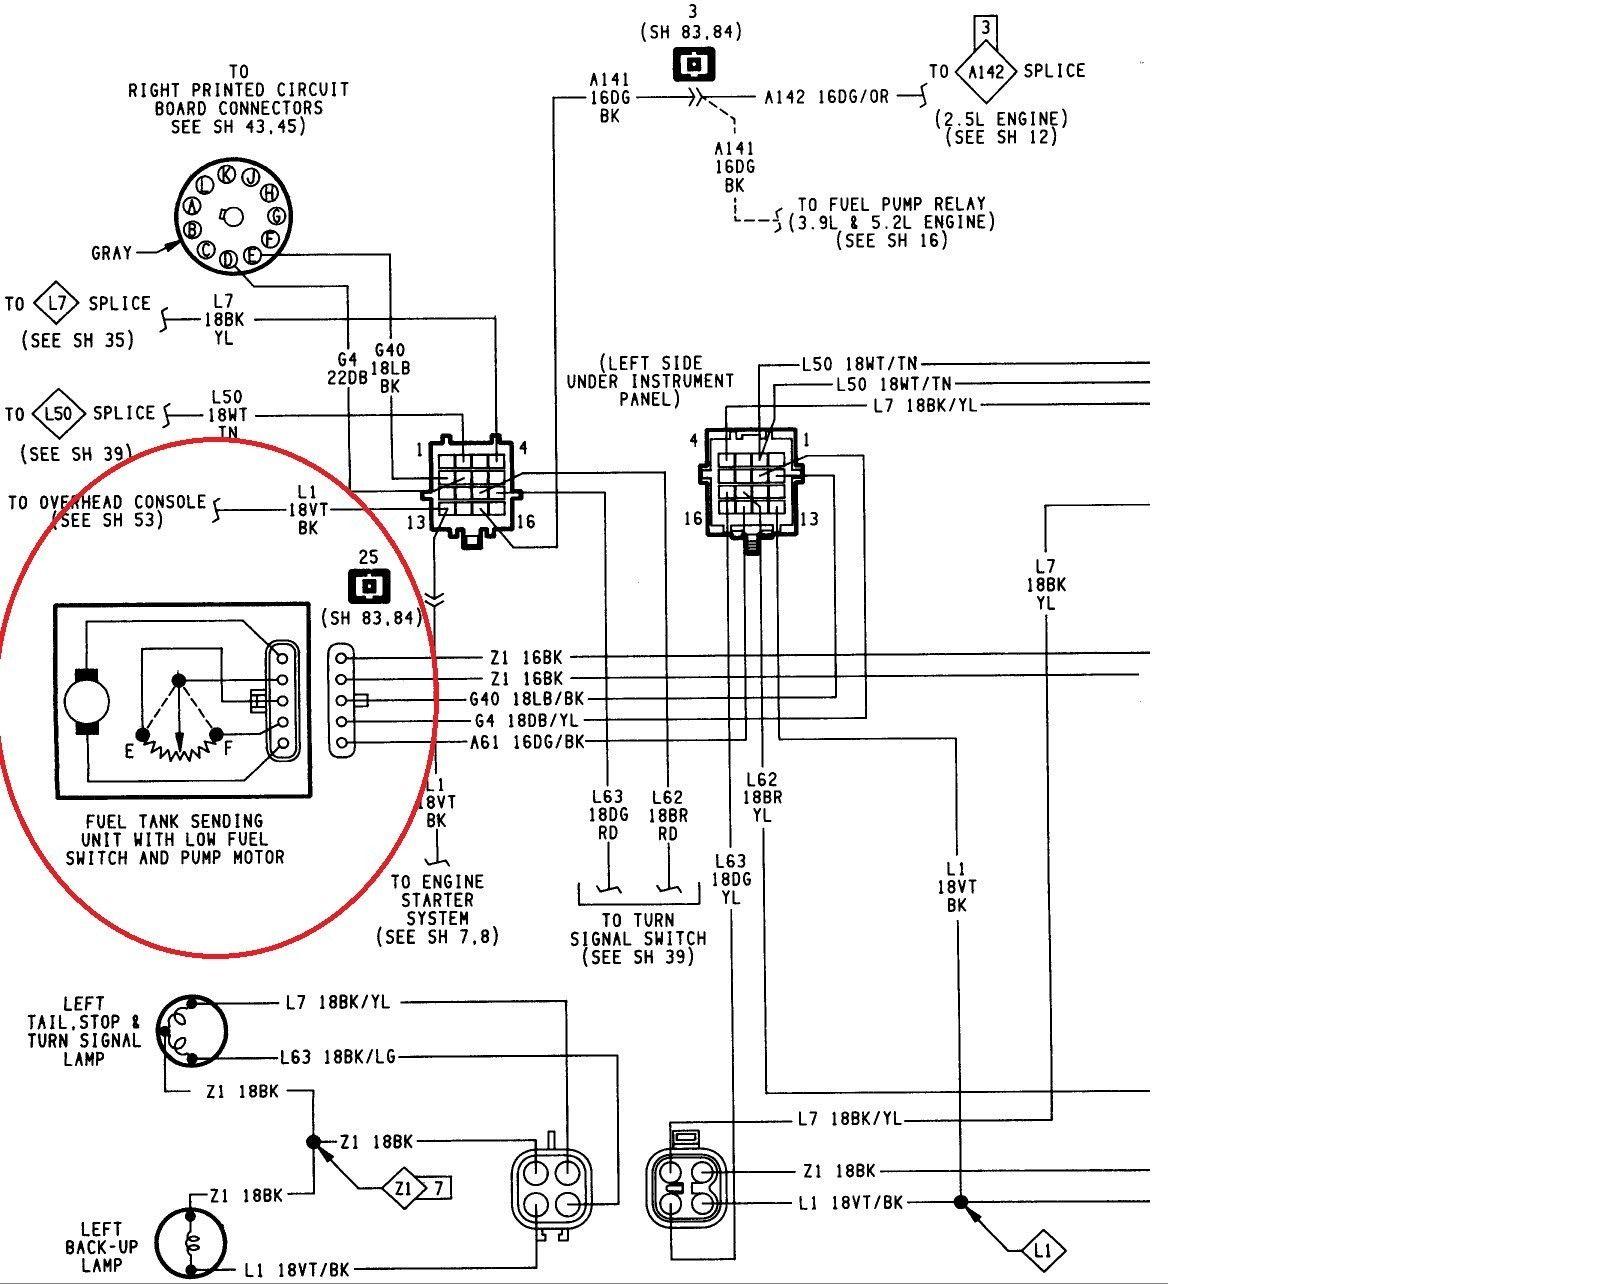 New 2002 Dodge Ram 1500 Headlight Wiring Diagram | Diagram, Trailer wiring  diagram, Wire Pinterest